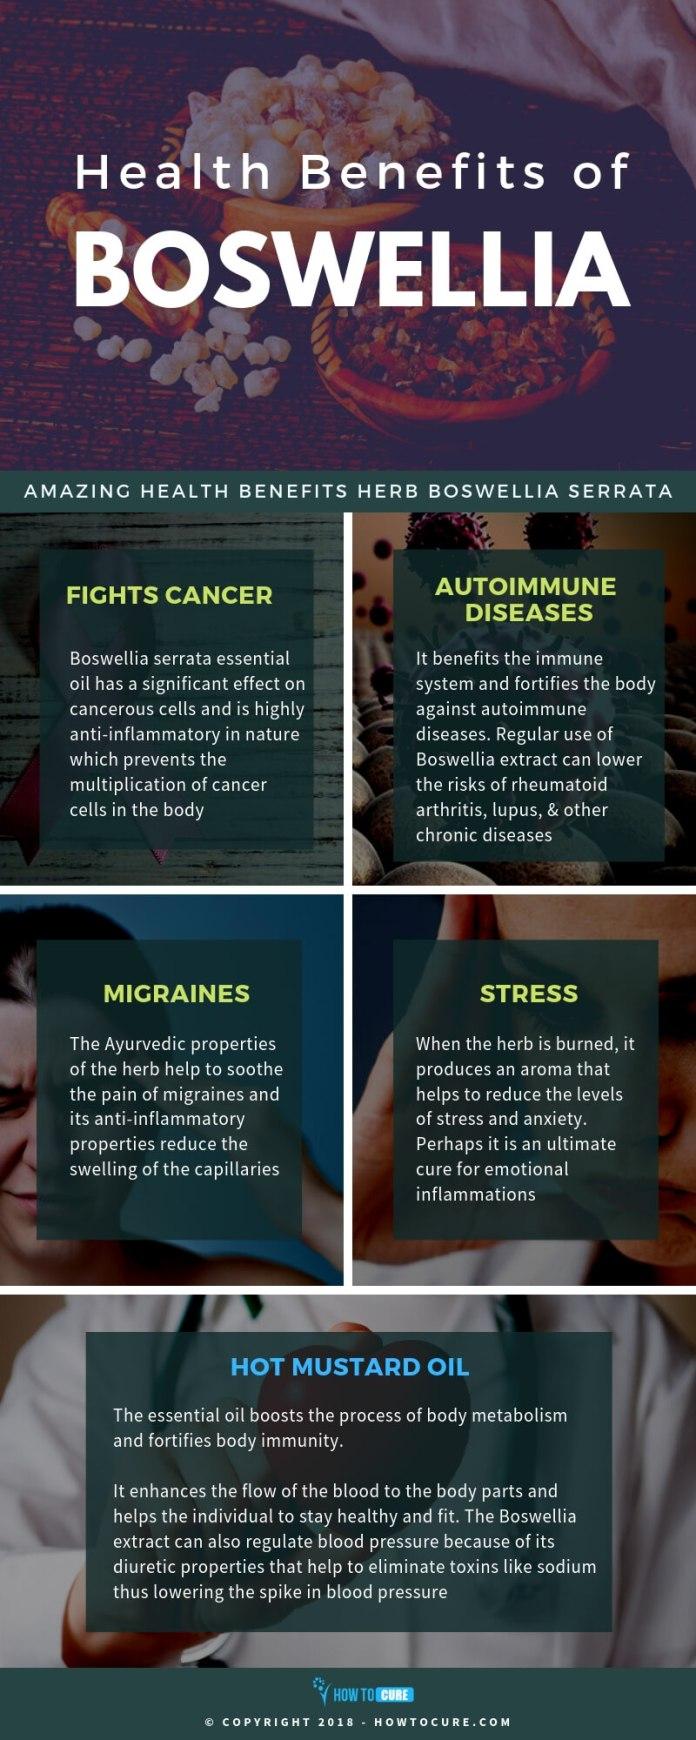 boswellia benefits